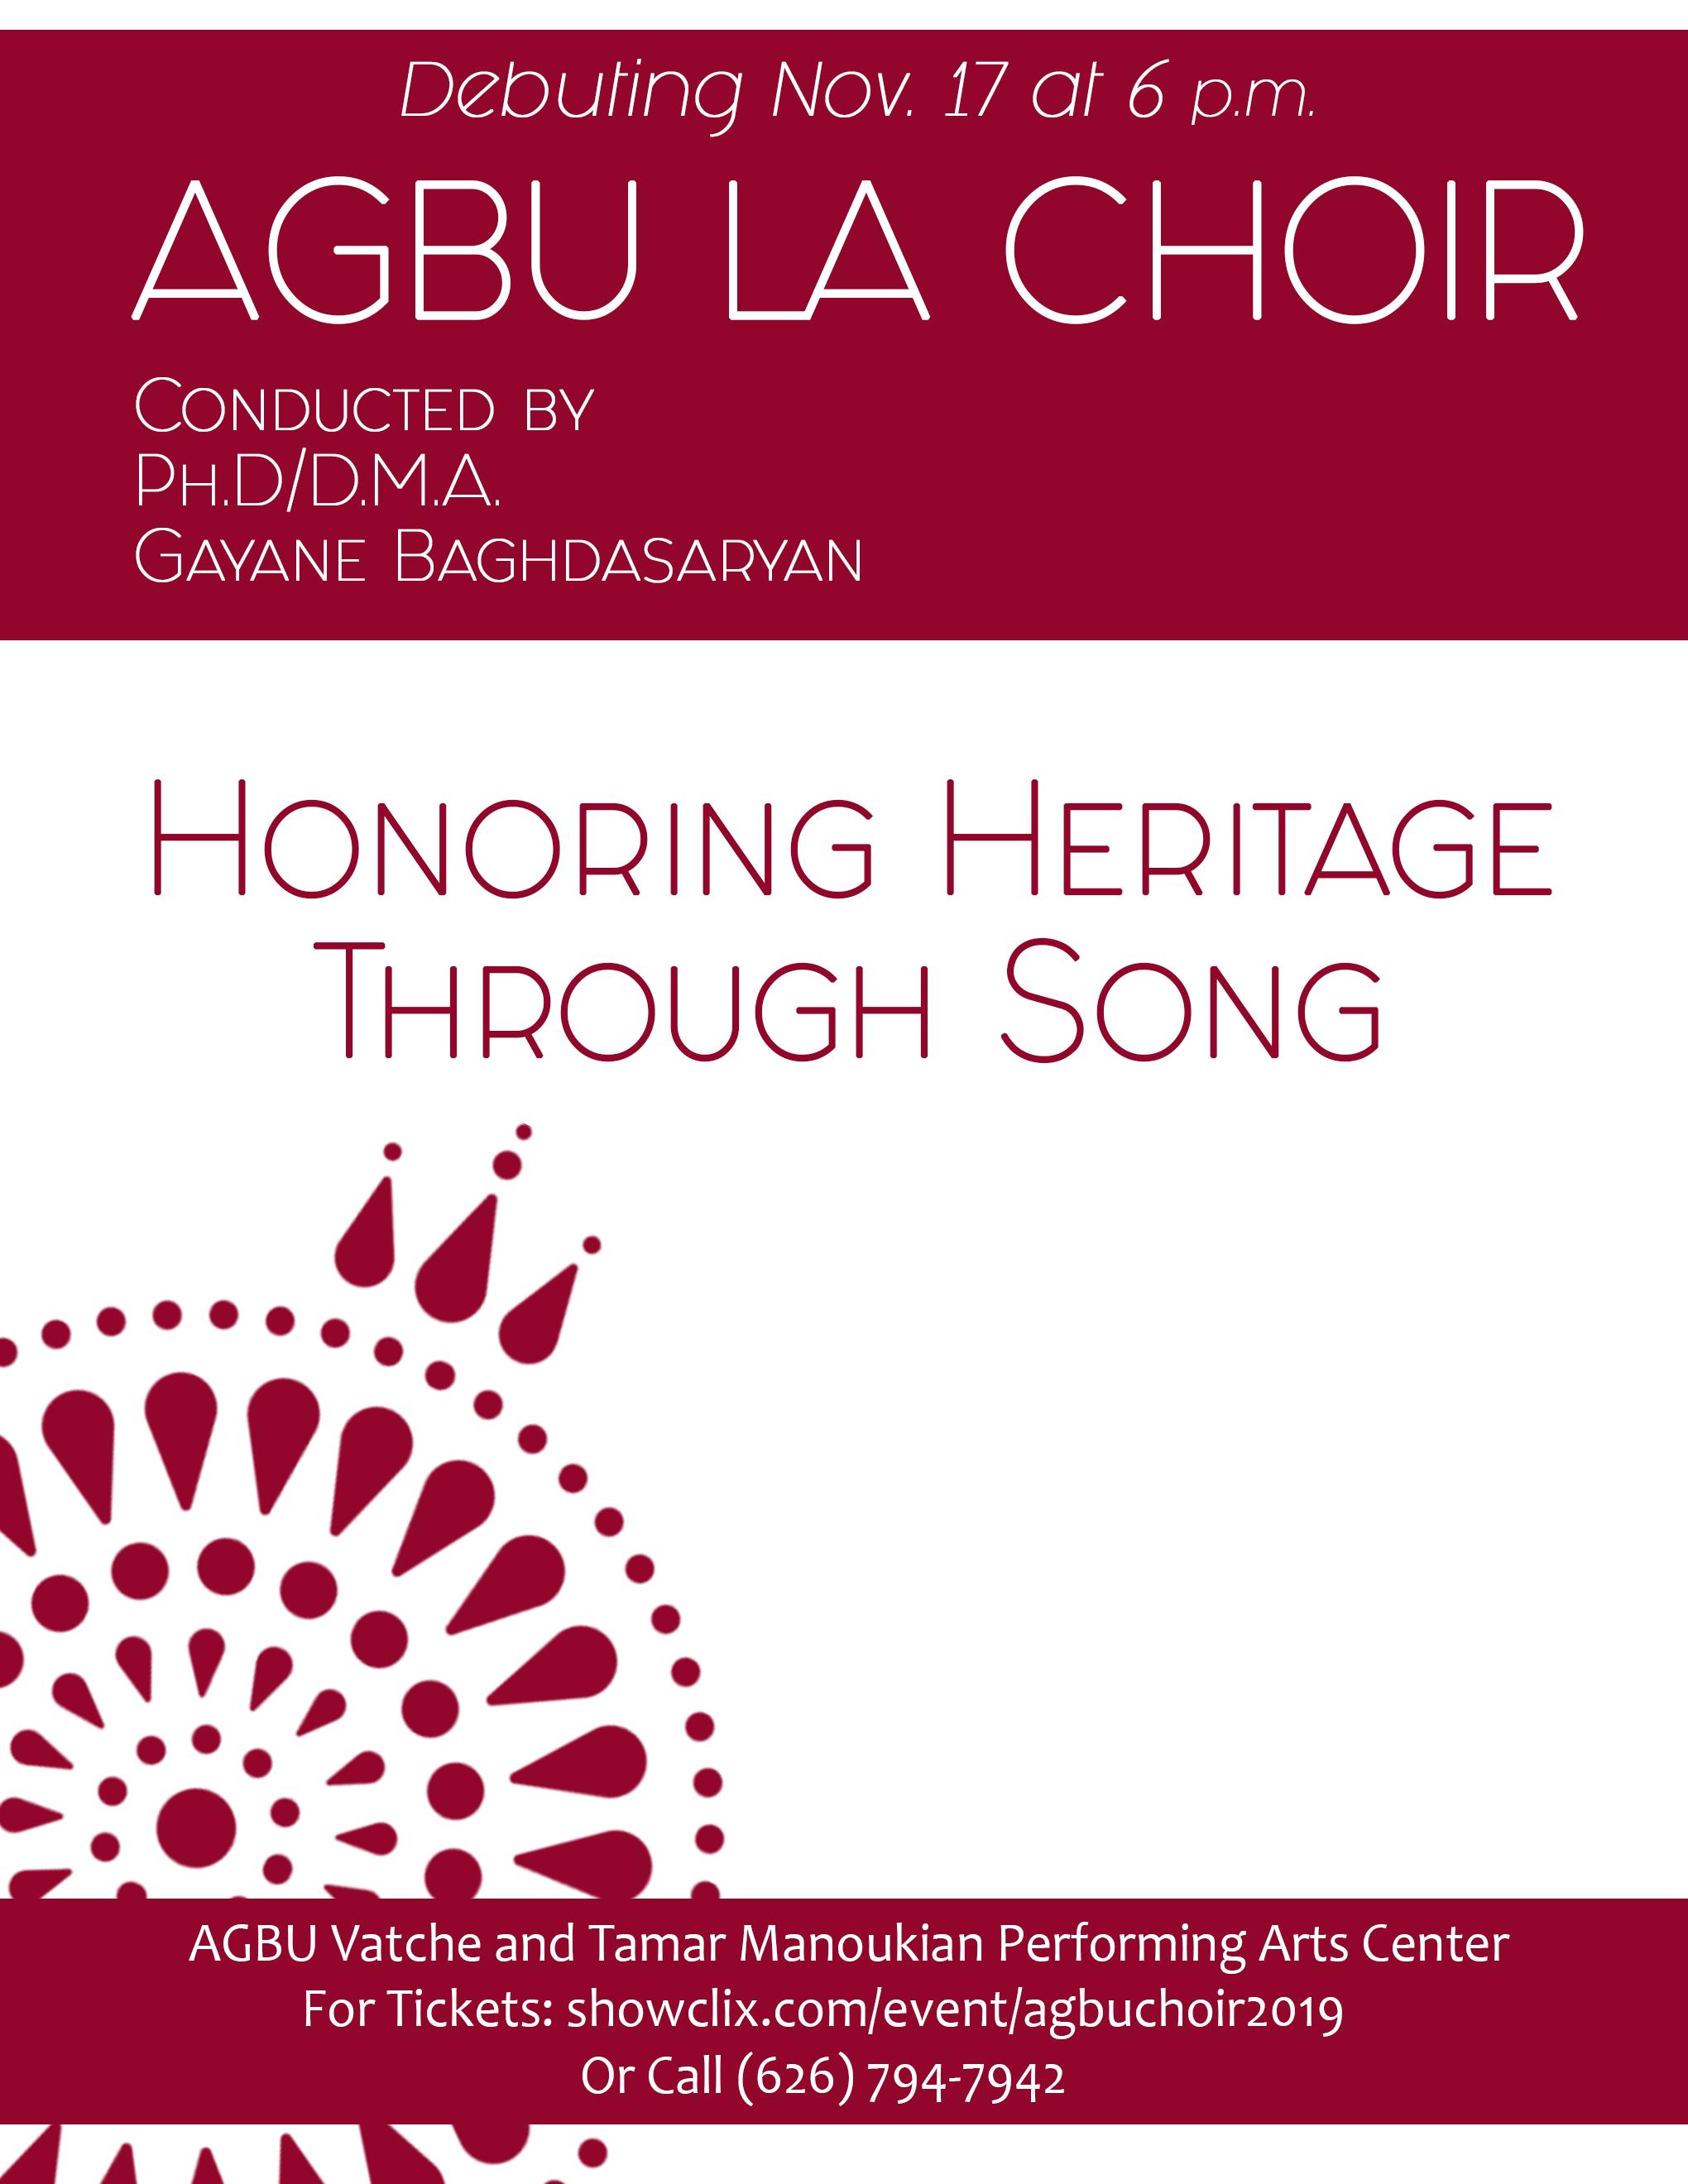 AGBU LA Choir's Debut Concert